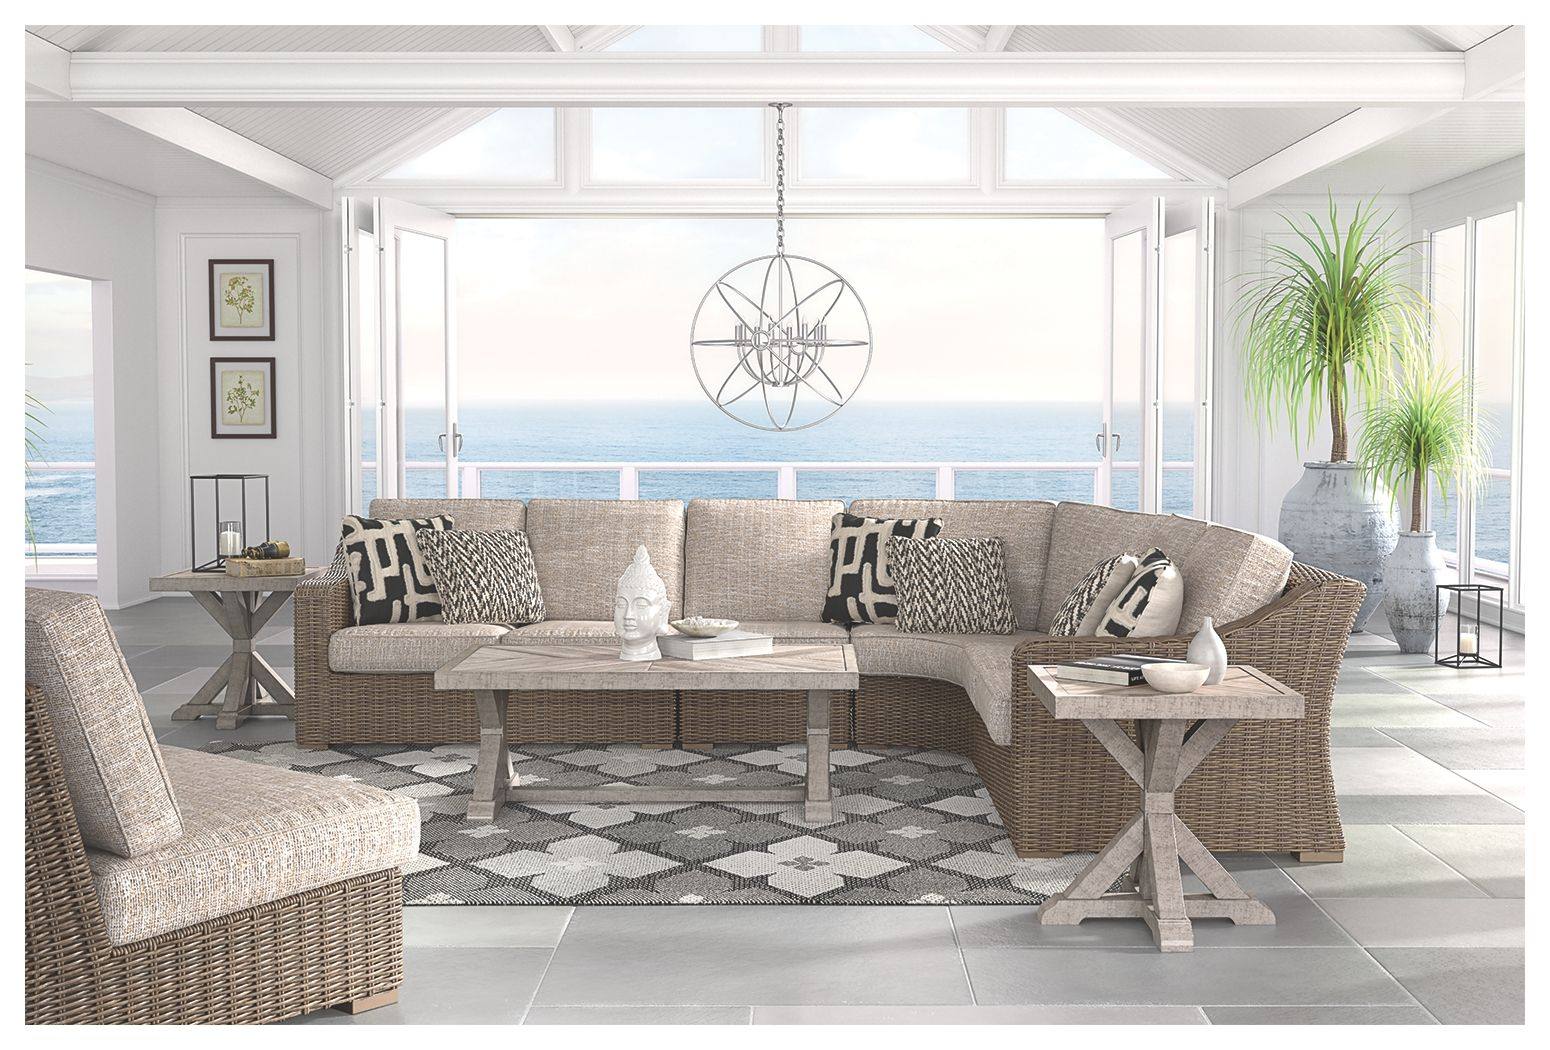 Beachcroft Armless Chair with Cushion, Beige | Outdoor ... on Beachcroft Beige Outdoor Living Room Set  id=75362